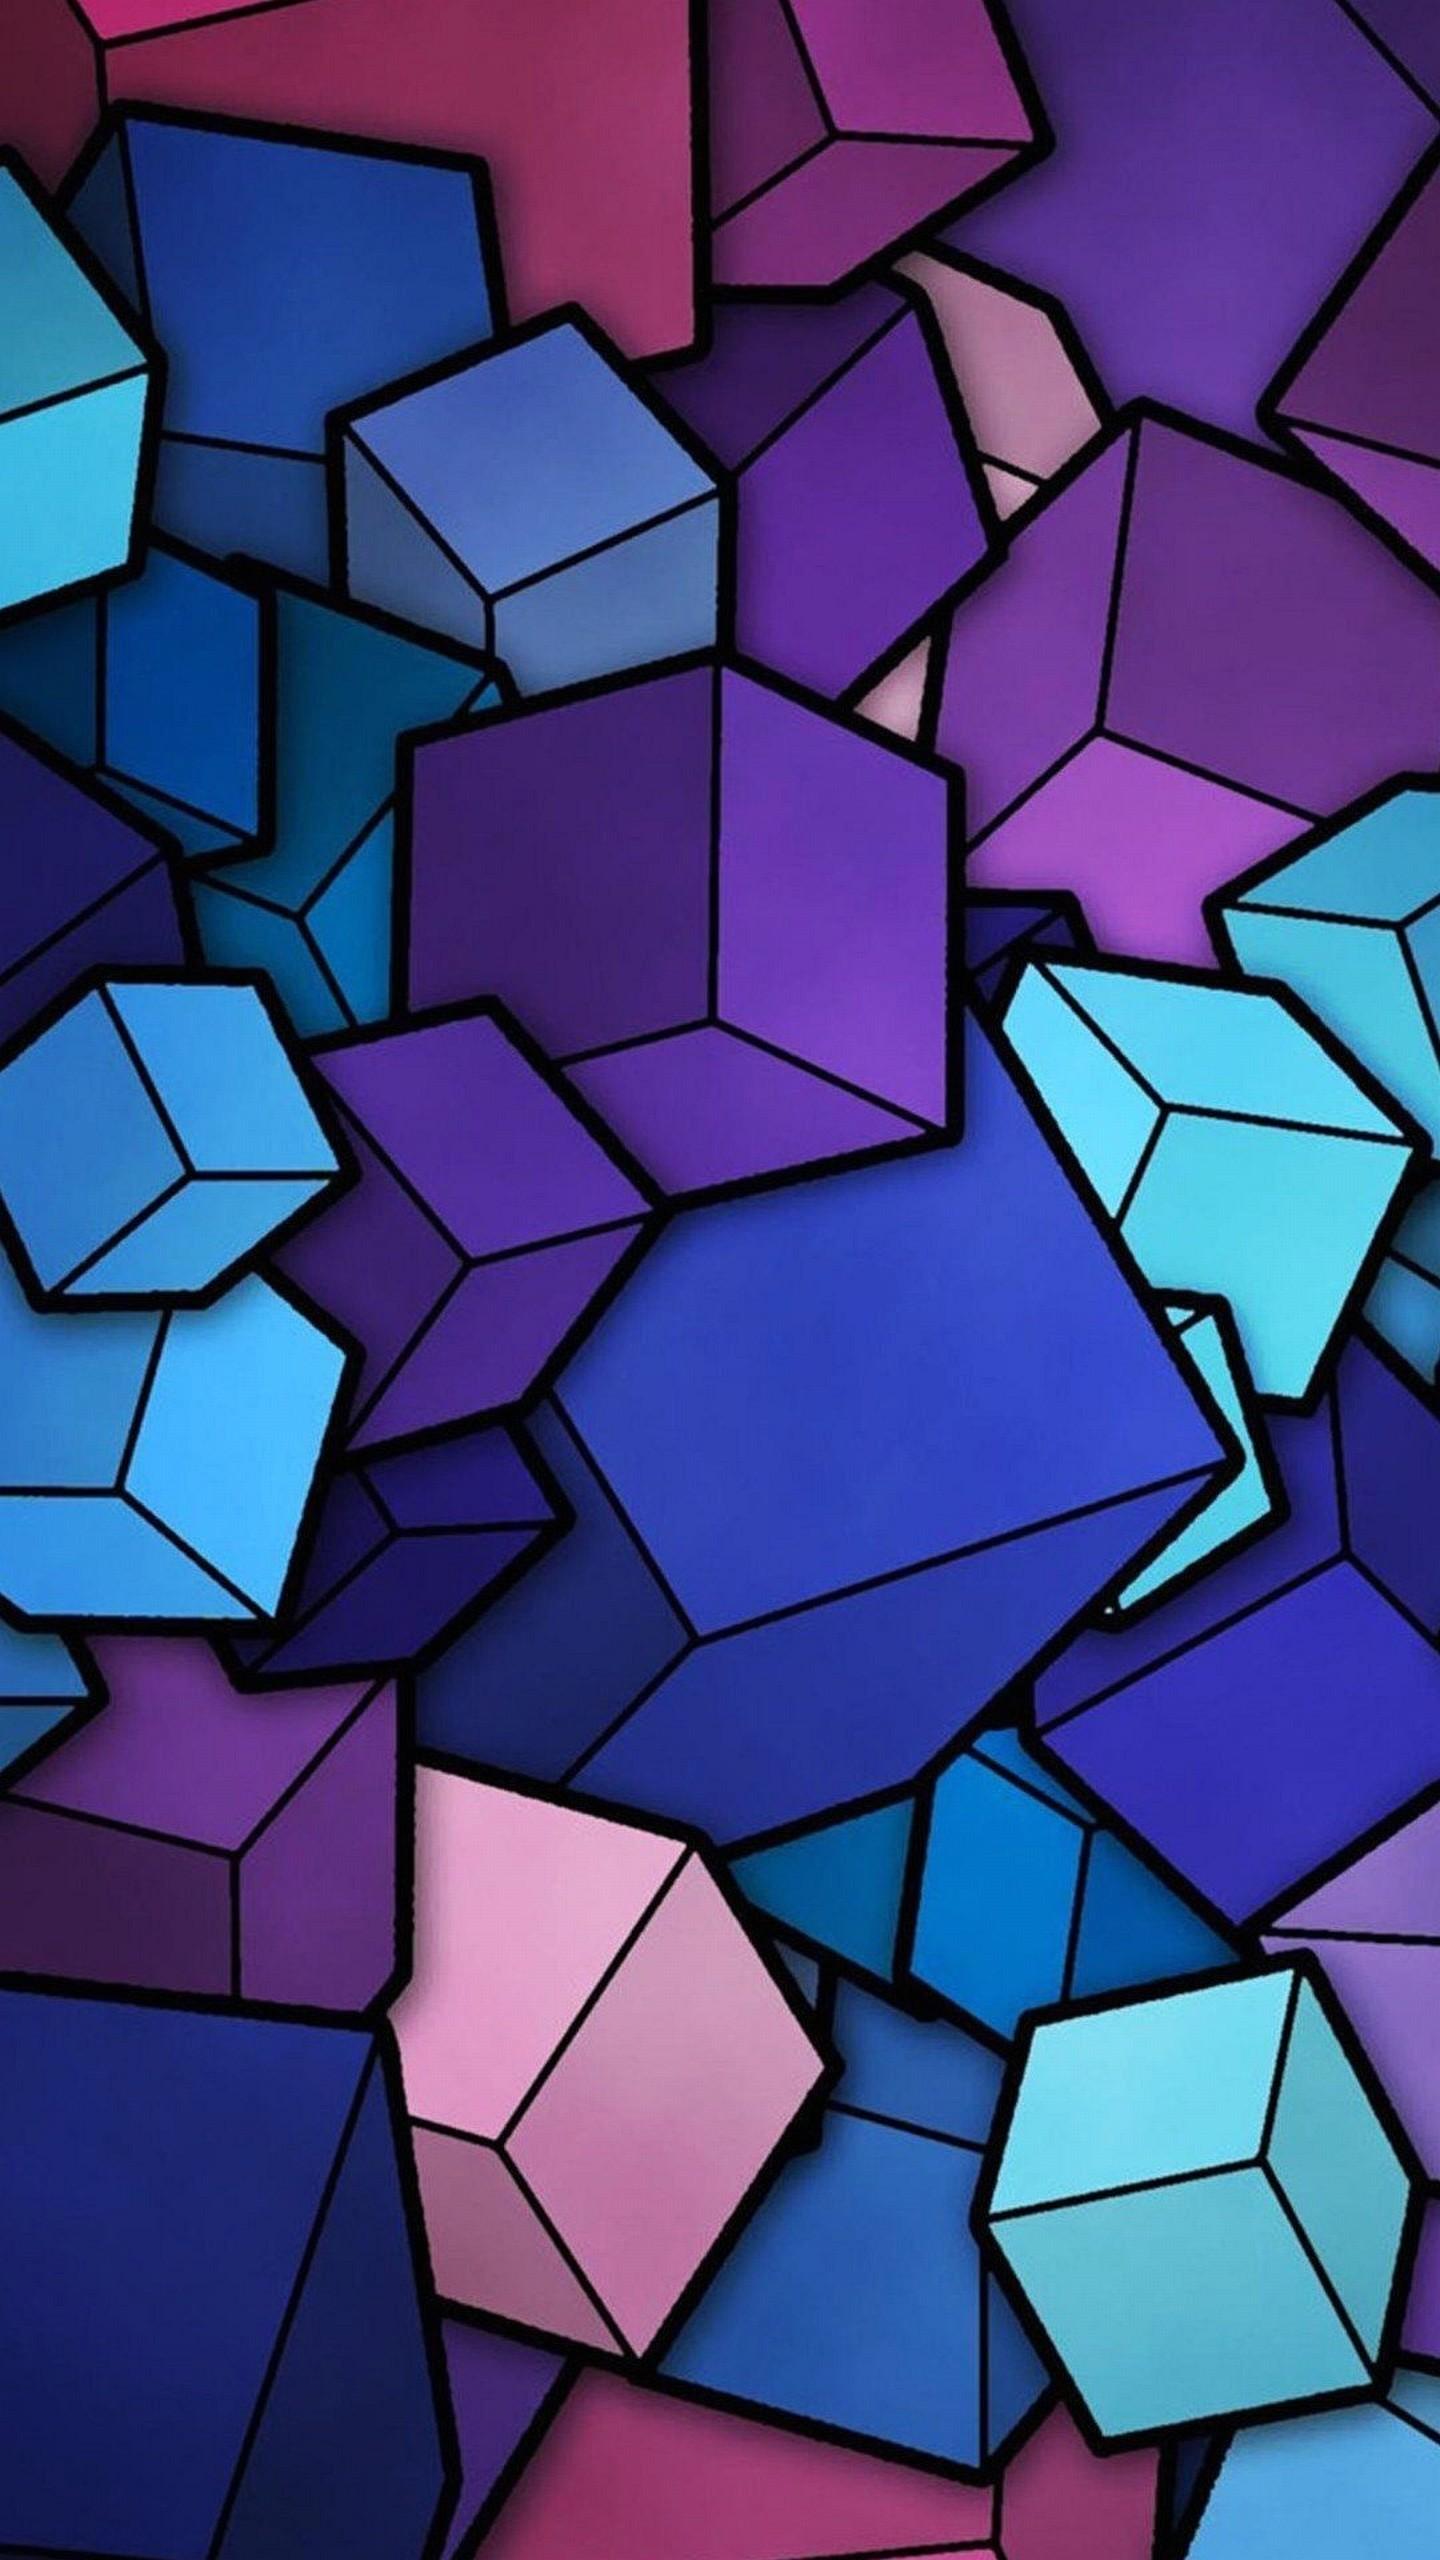 Z Wallpaper Lg G3 Cubes Abstract 1440 2560 241